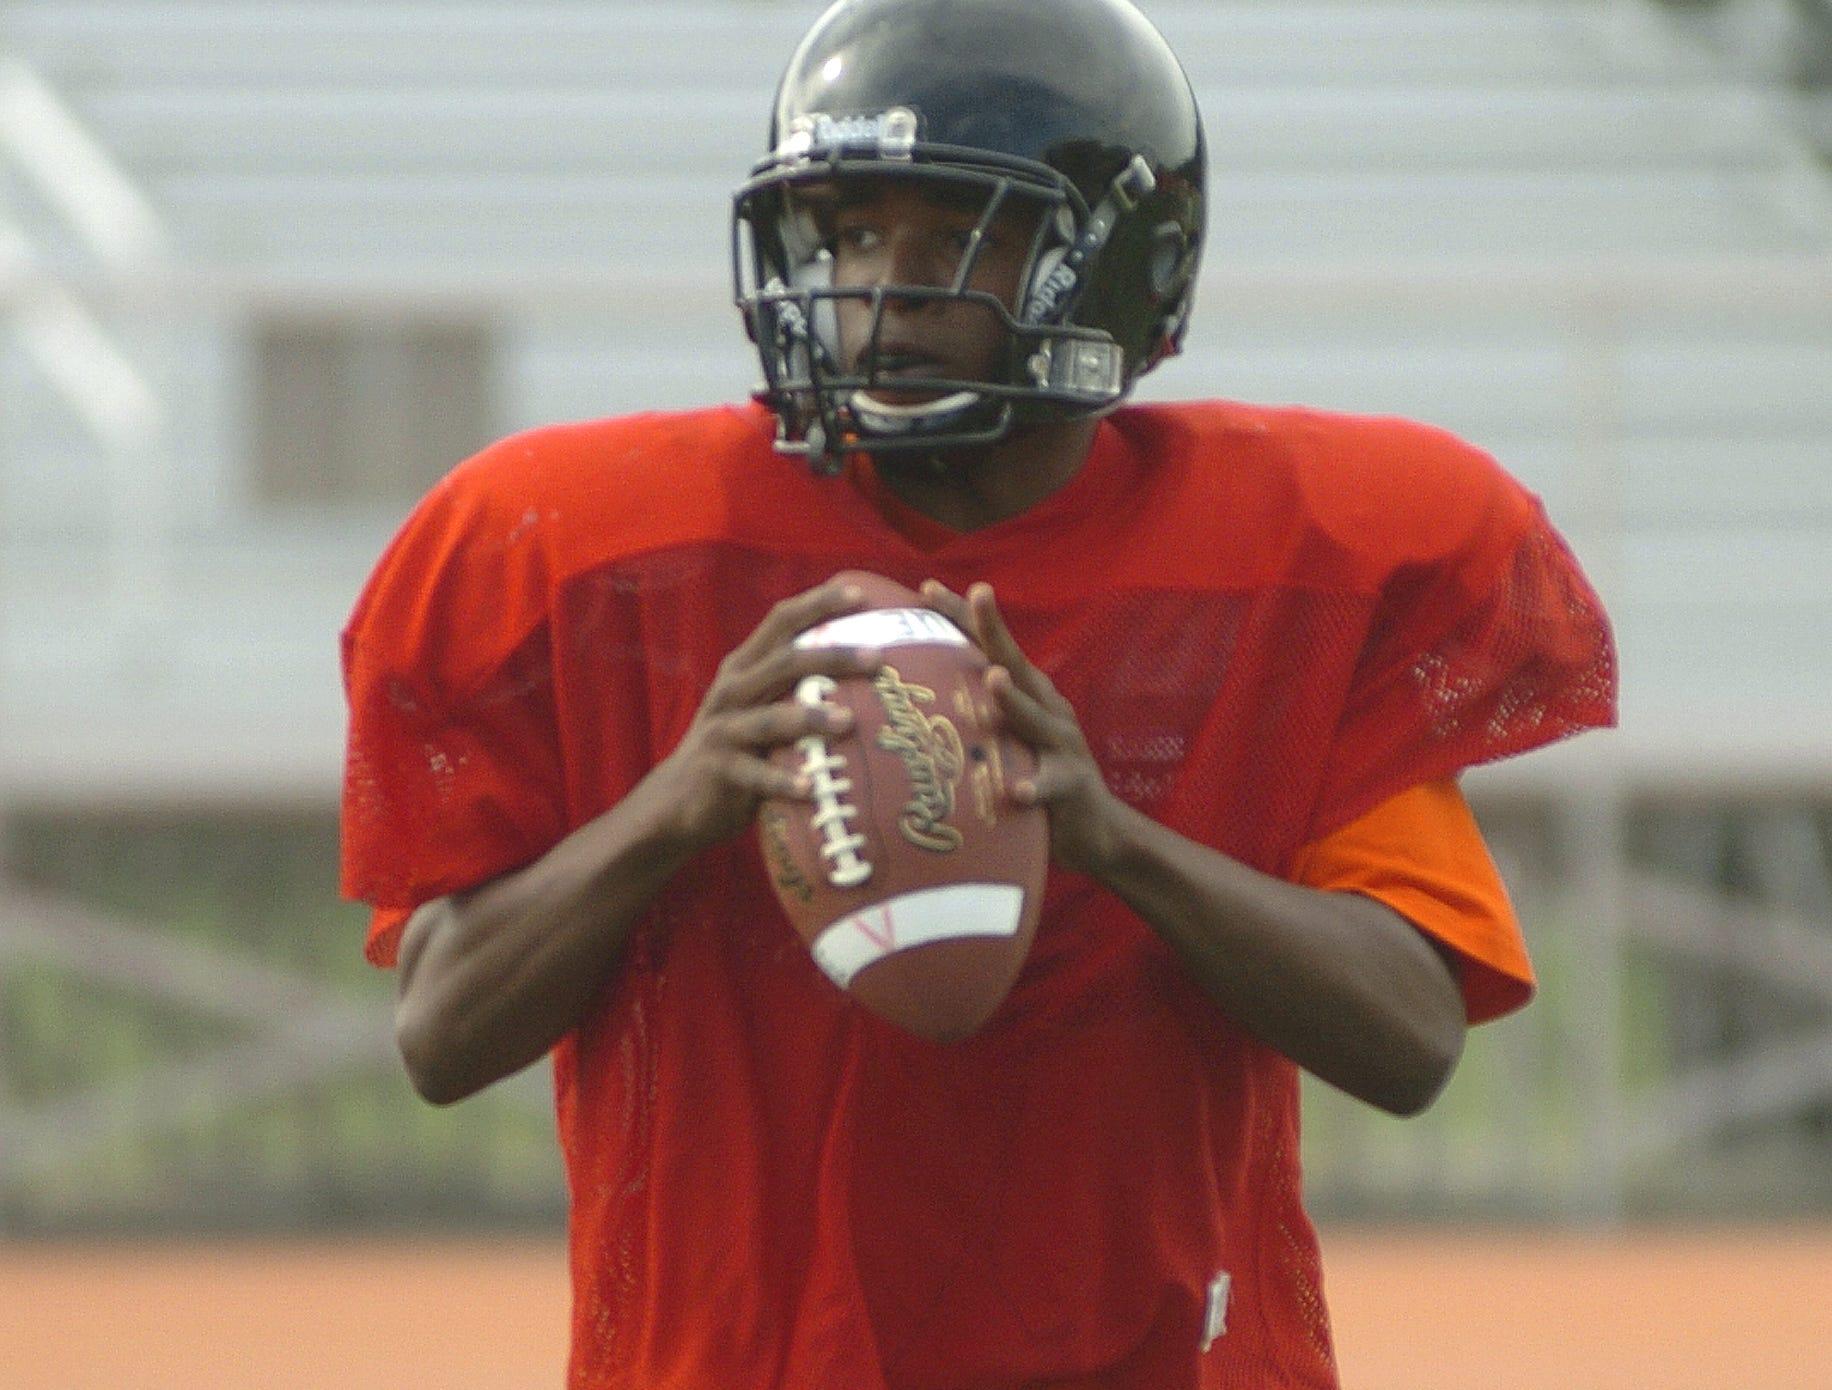 2003 Union-Endicott quarterback Jermaine Thomas looks for a receiver during practice.